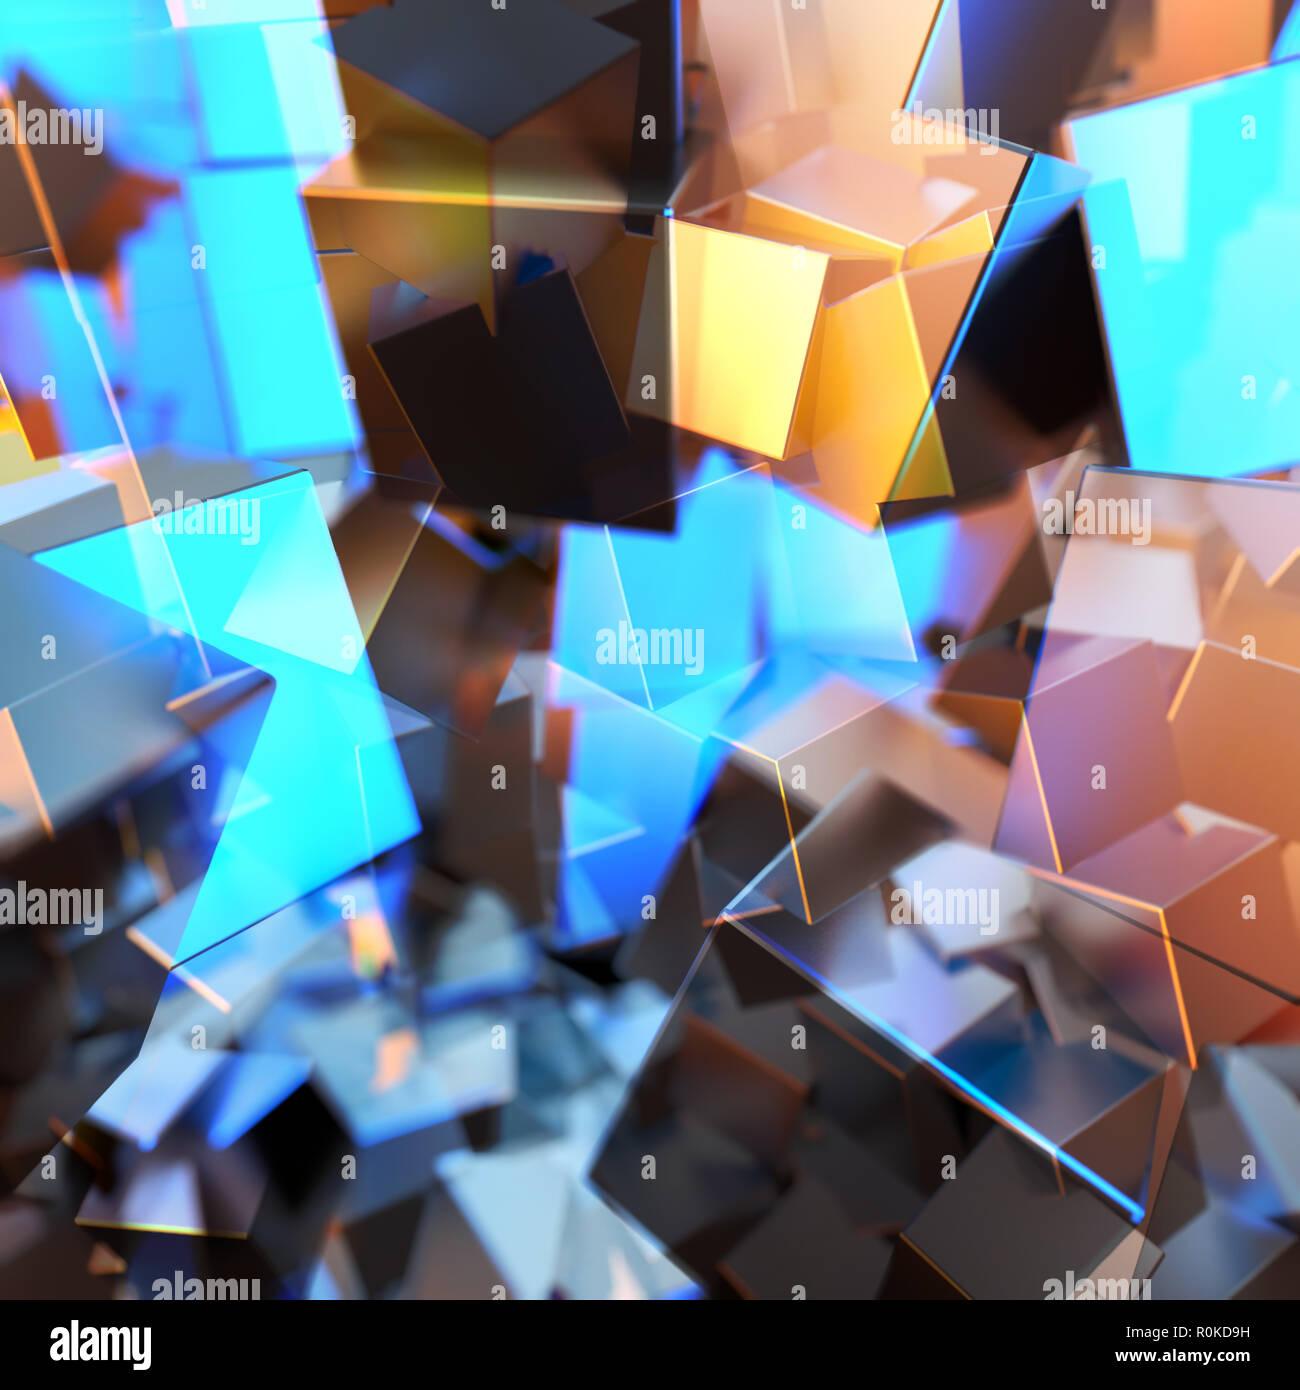 83cc4554e3da Plata u Oro blanco platino cubos bloques de fondo. Modelado 3d ilustración.  la riqueza minera concepto bitcoin . Dinero finanzas negocio creciente  éxito ...